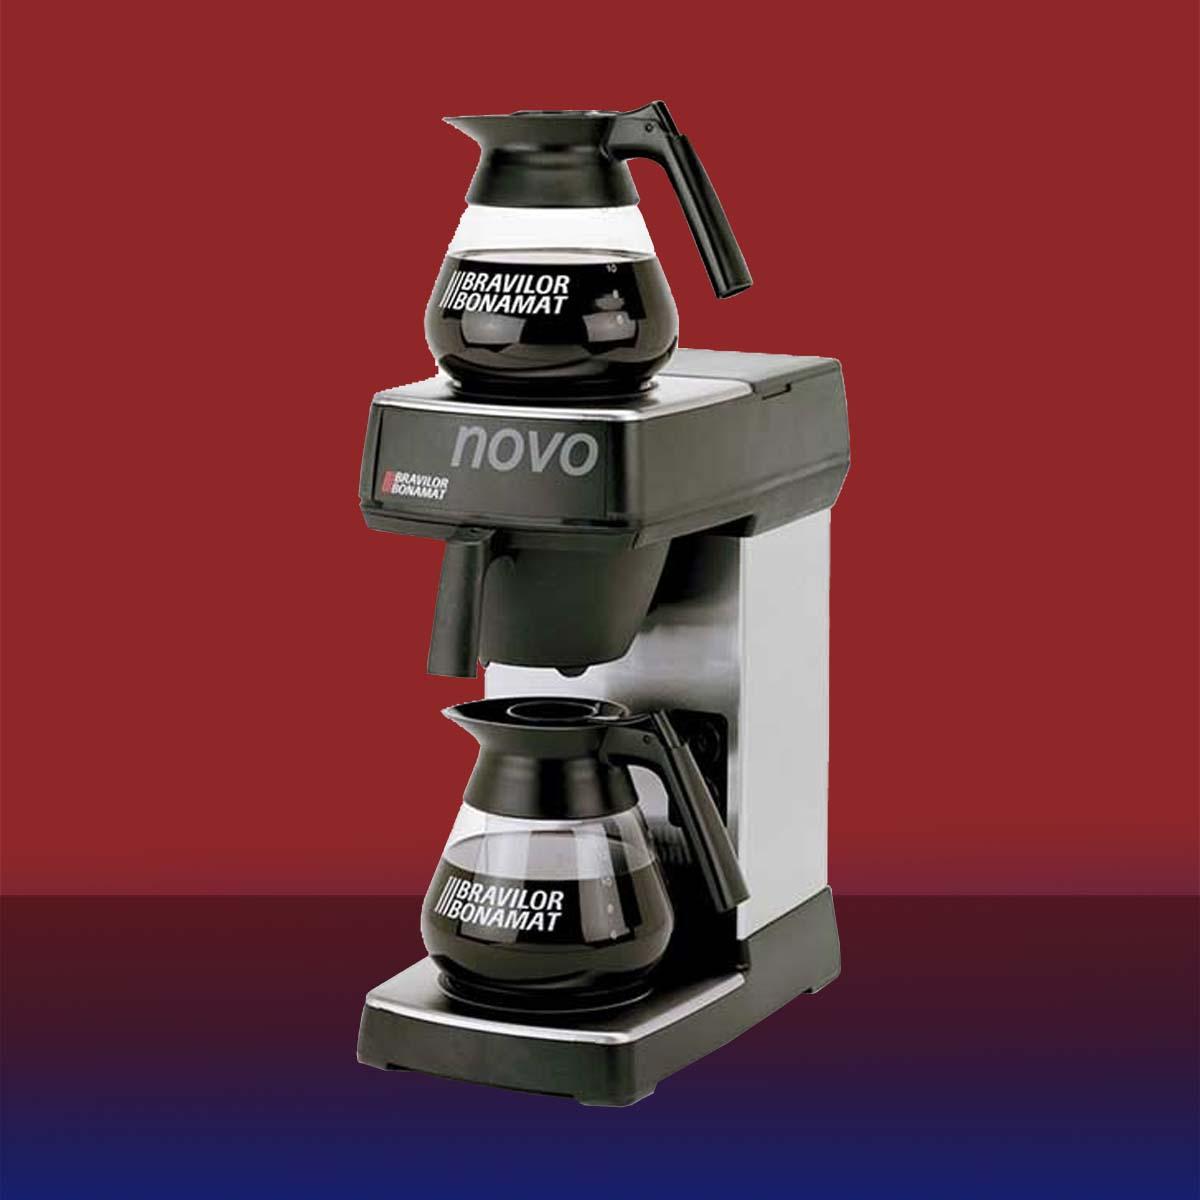 Kaffemaskiner til private og erhverv - Kaffemøllen